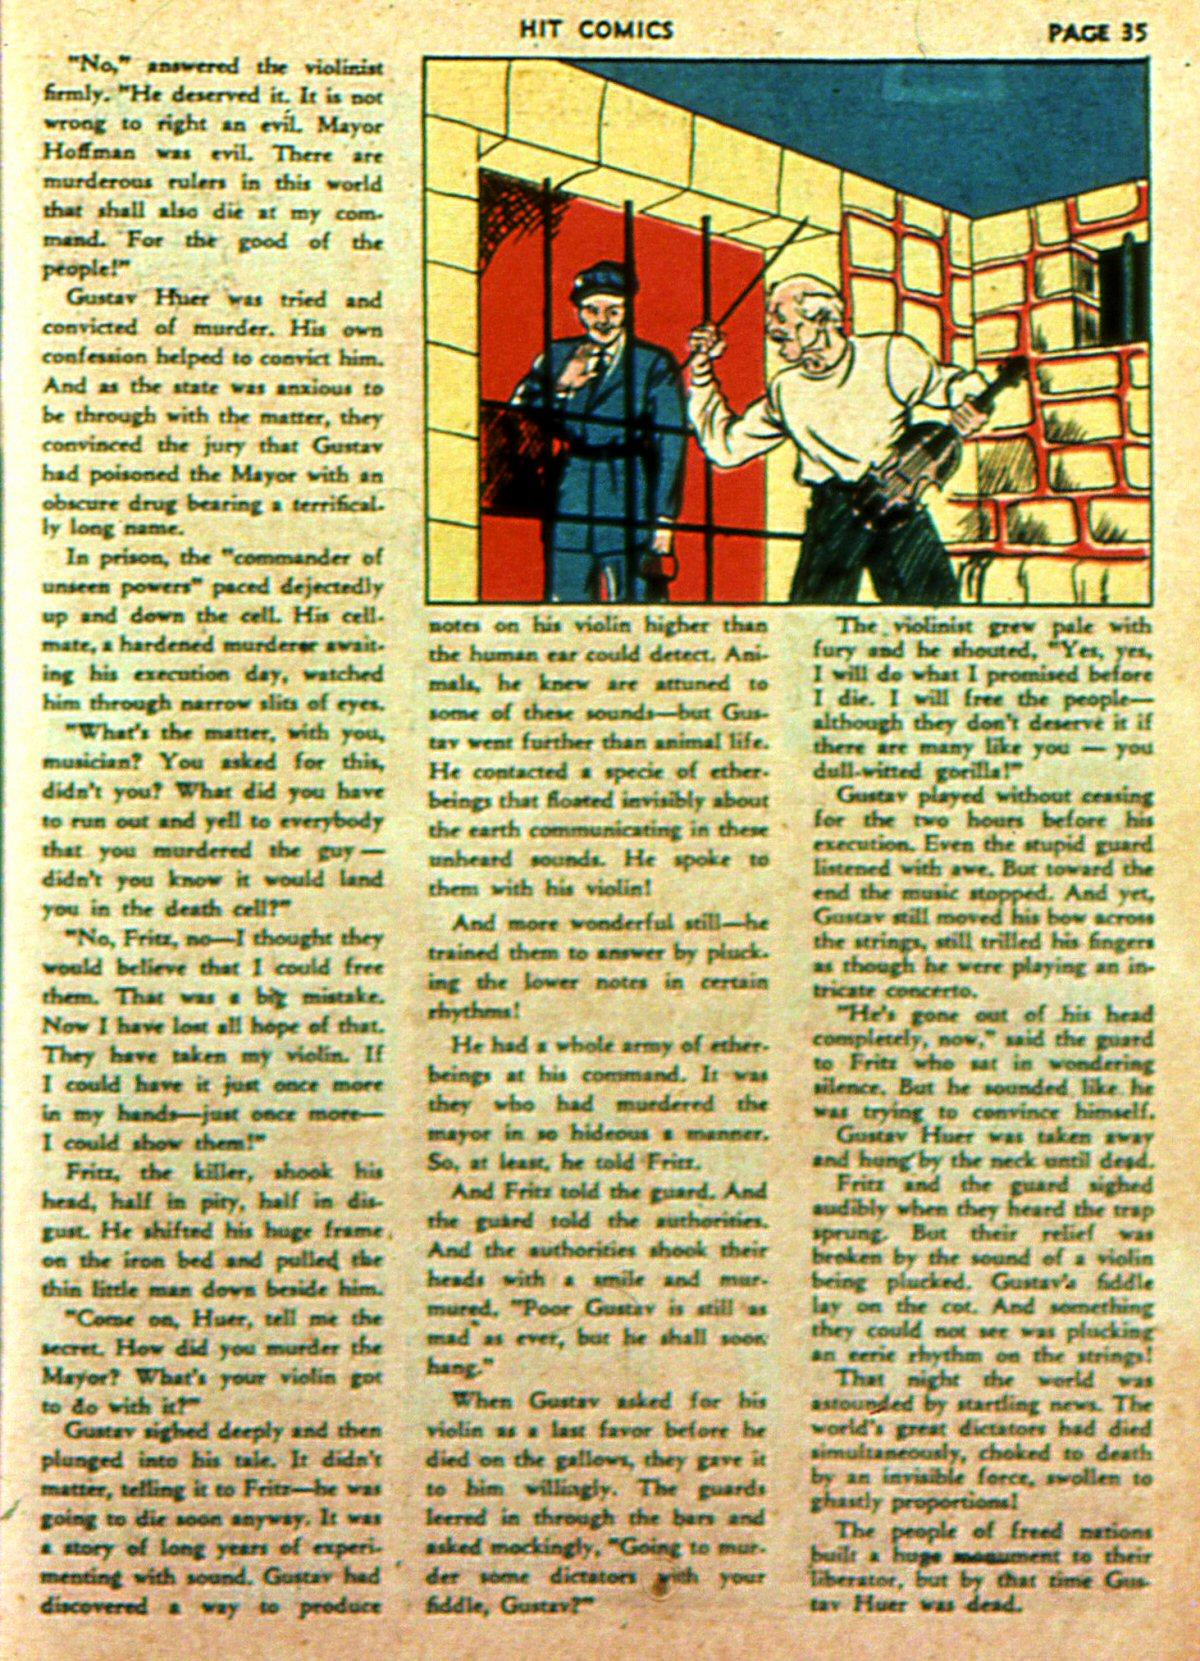 Read online Hit Comics comic -  Issue #2 - 37